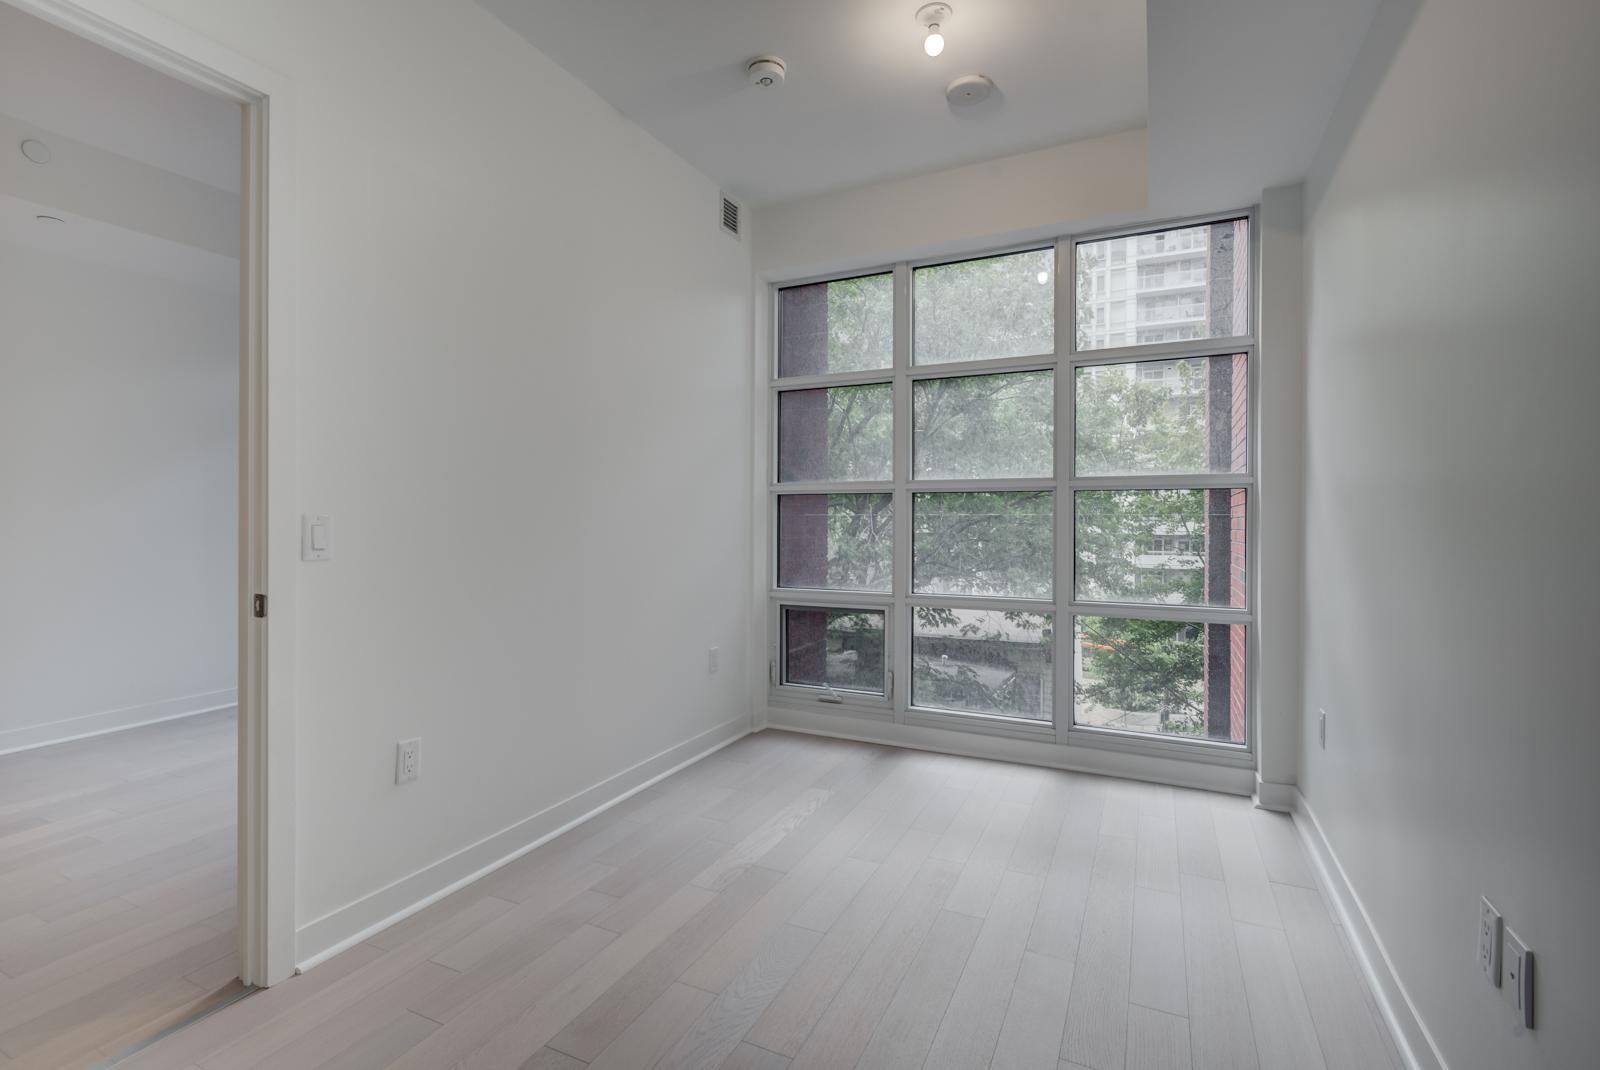 Empty master bedroom with floor-to-ceiling windows.